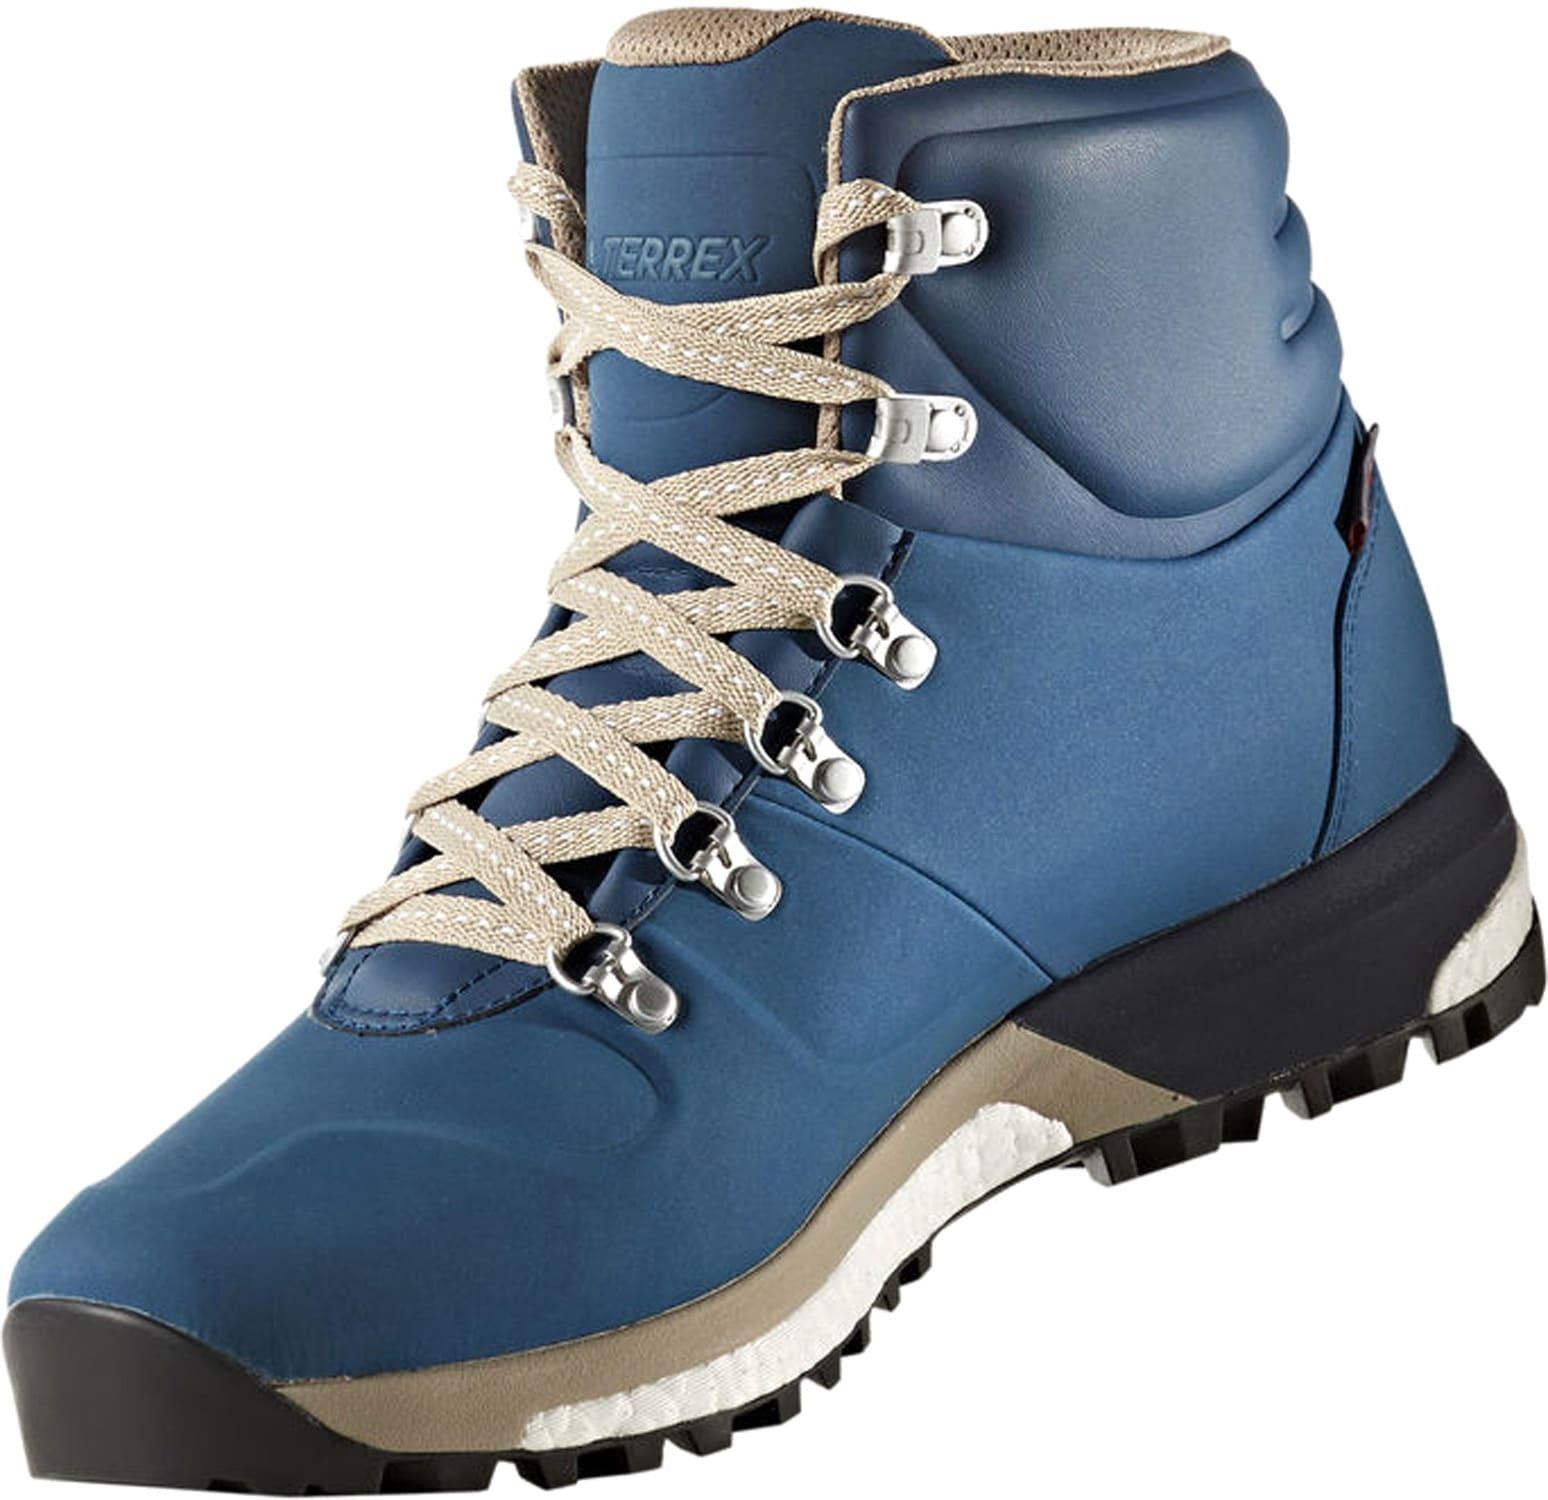 c0442a6ac8eefd Adidas Terrex Pathmaker CW Hiking Boots - thumbnail 2